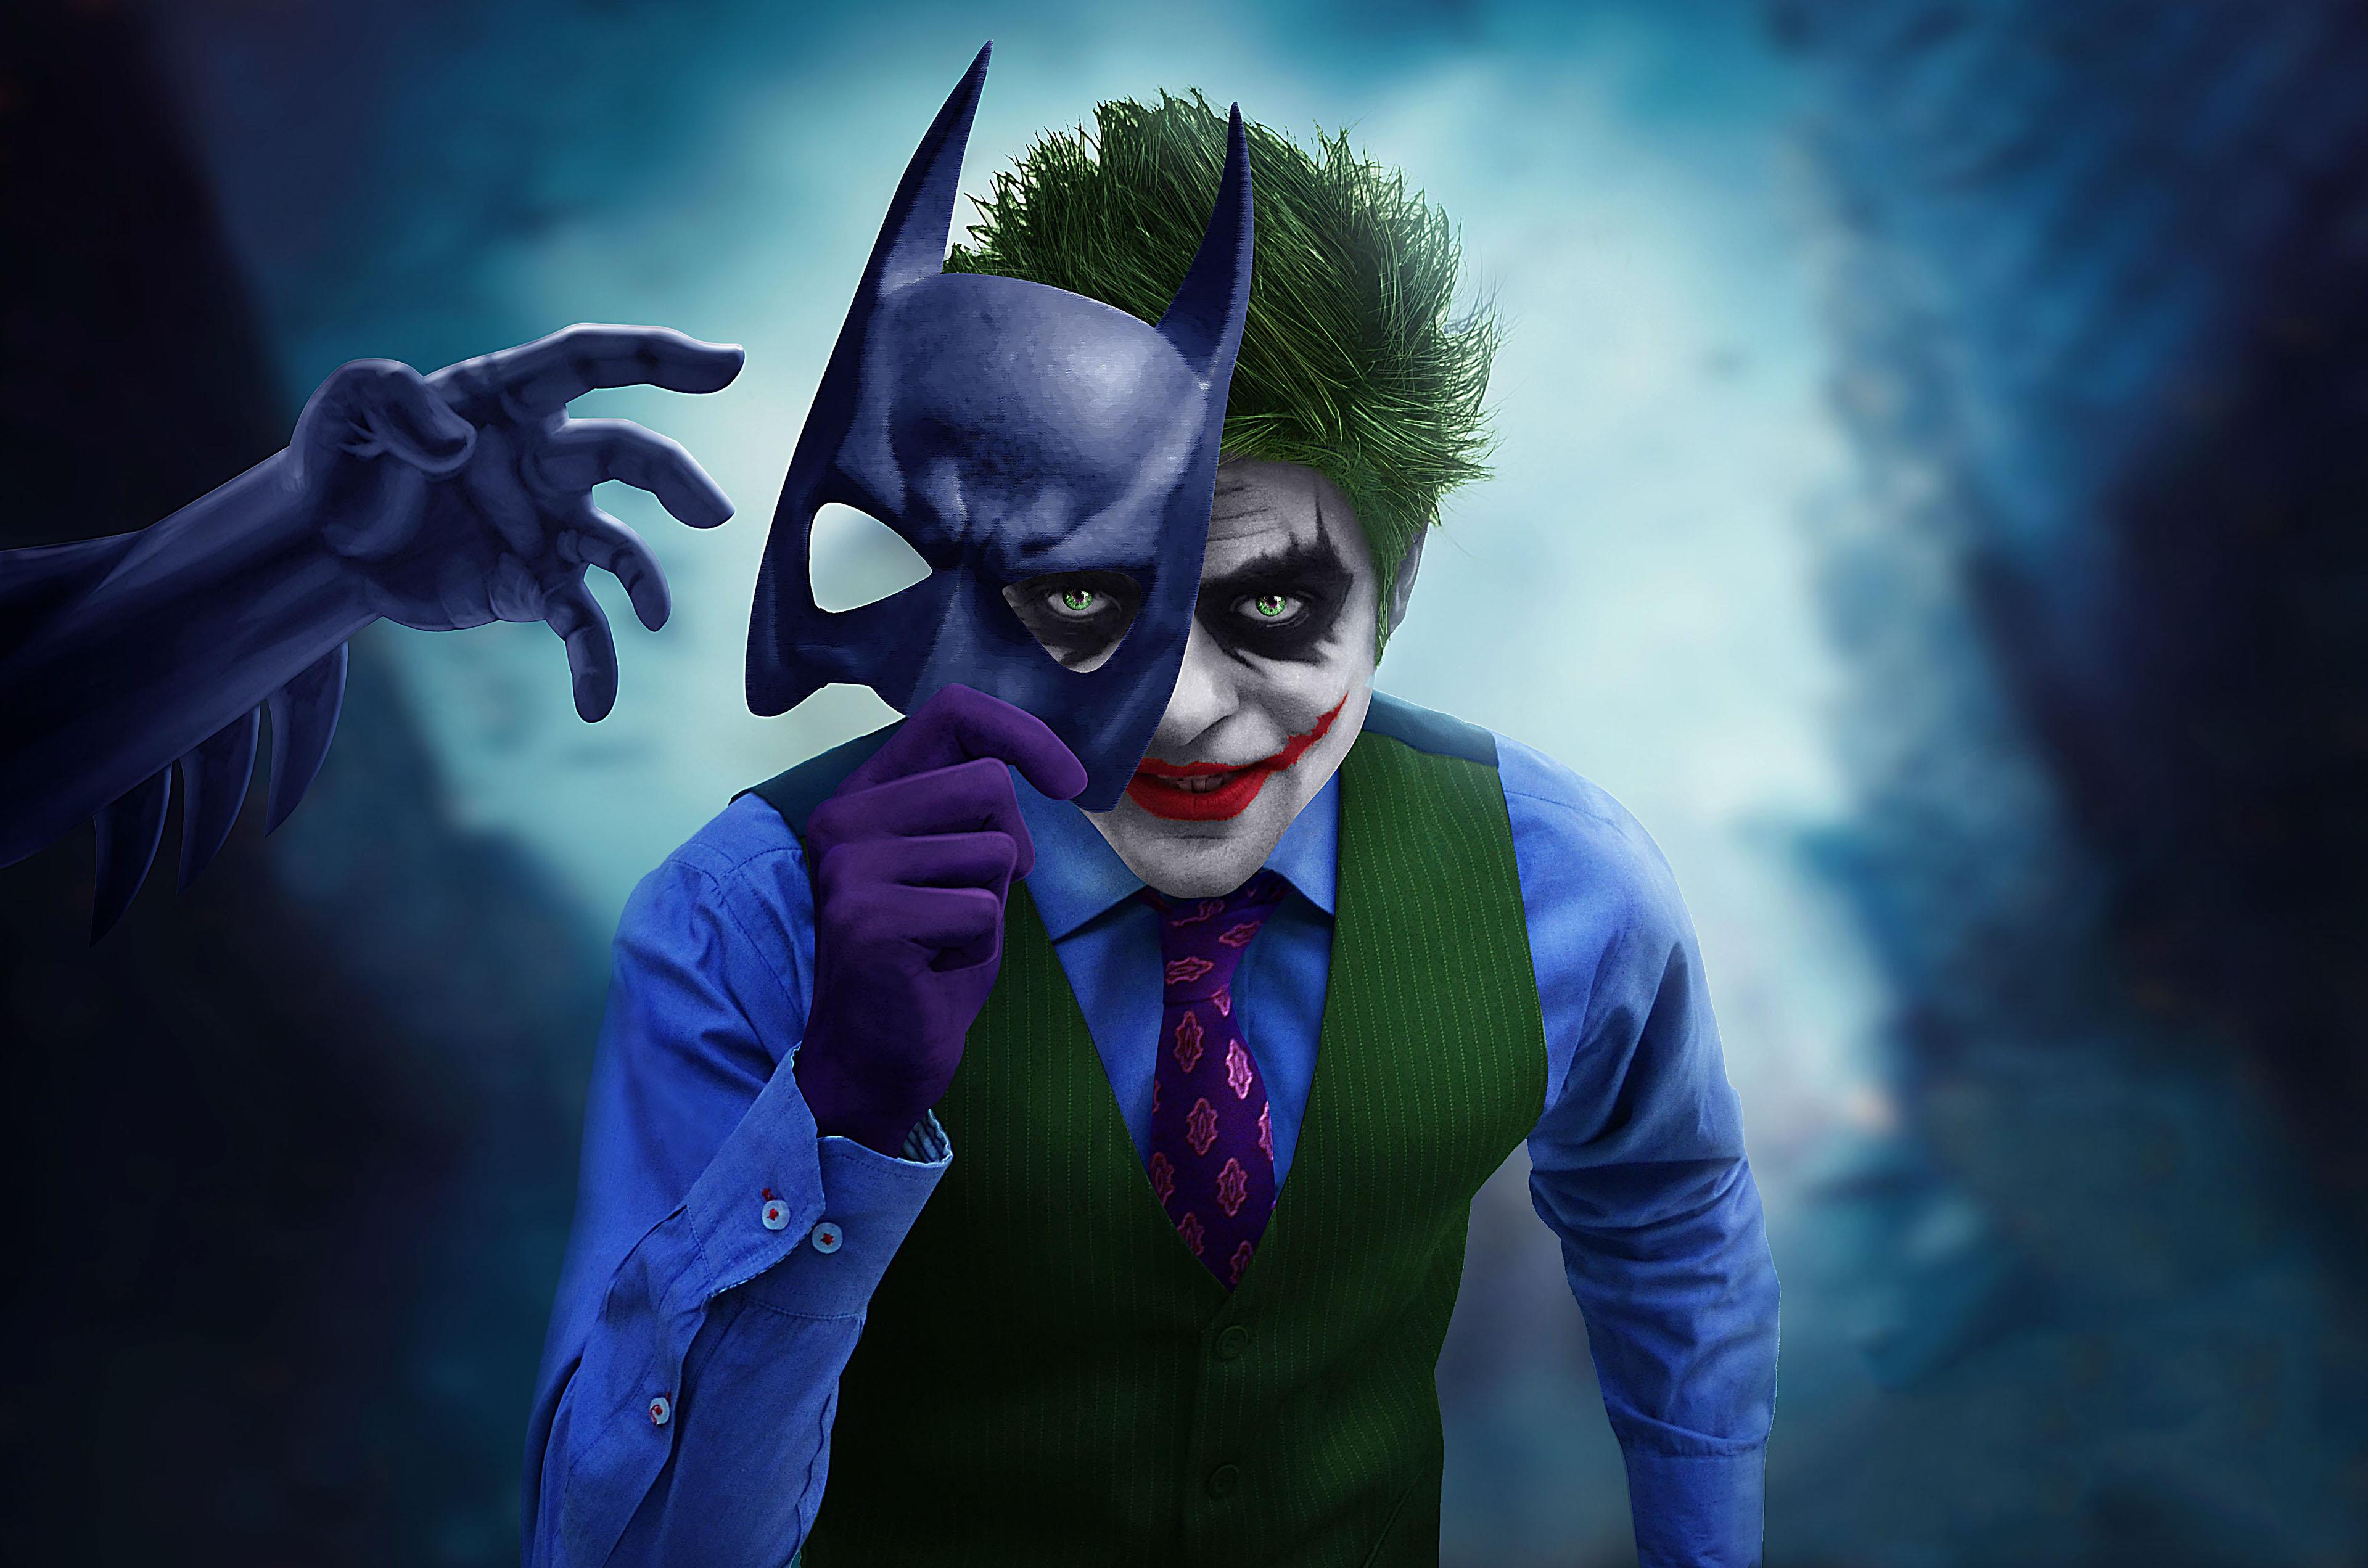 Joker With Batman Mask Off, HD Superheroes, 4k Wallpapers ...